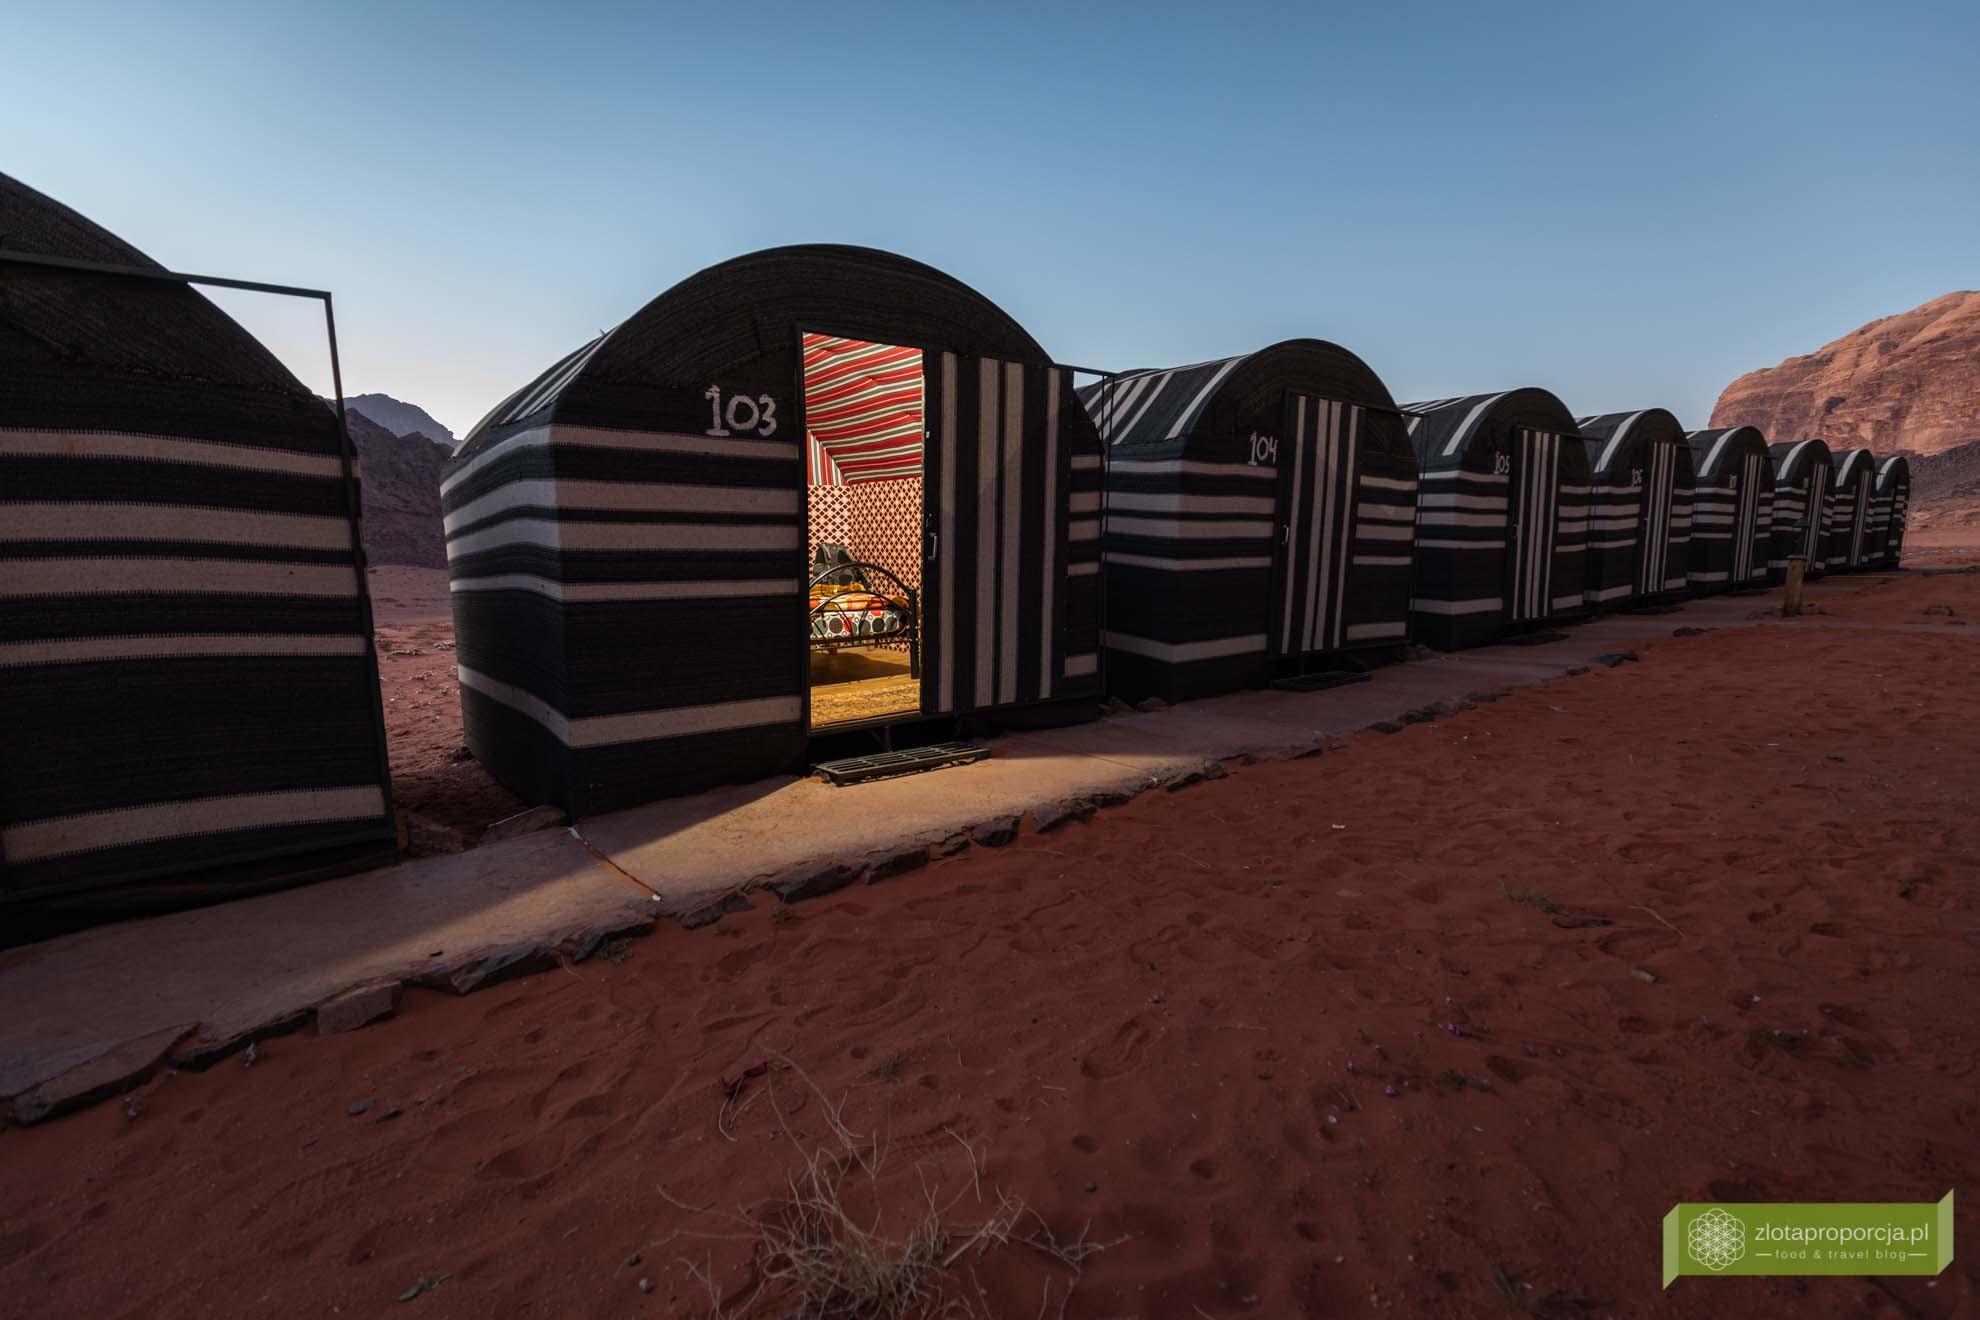 Jordania; Wadi Rum, pustynia Wadi Rum, pustynia w Jordanii; nocleg w Wadi Rum, camp Wadi Rum;